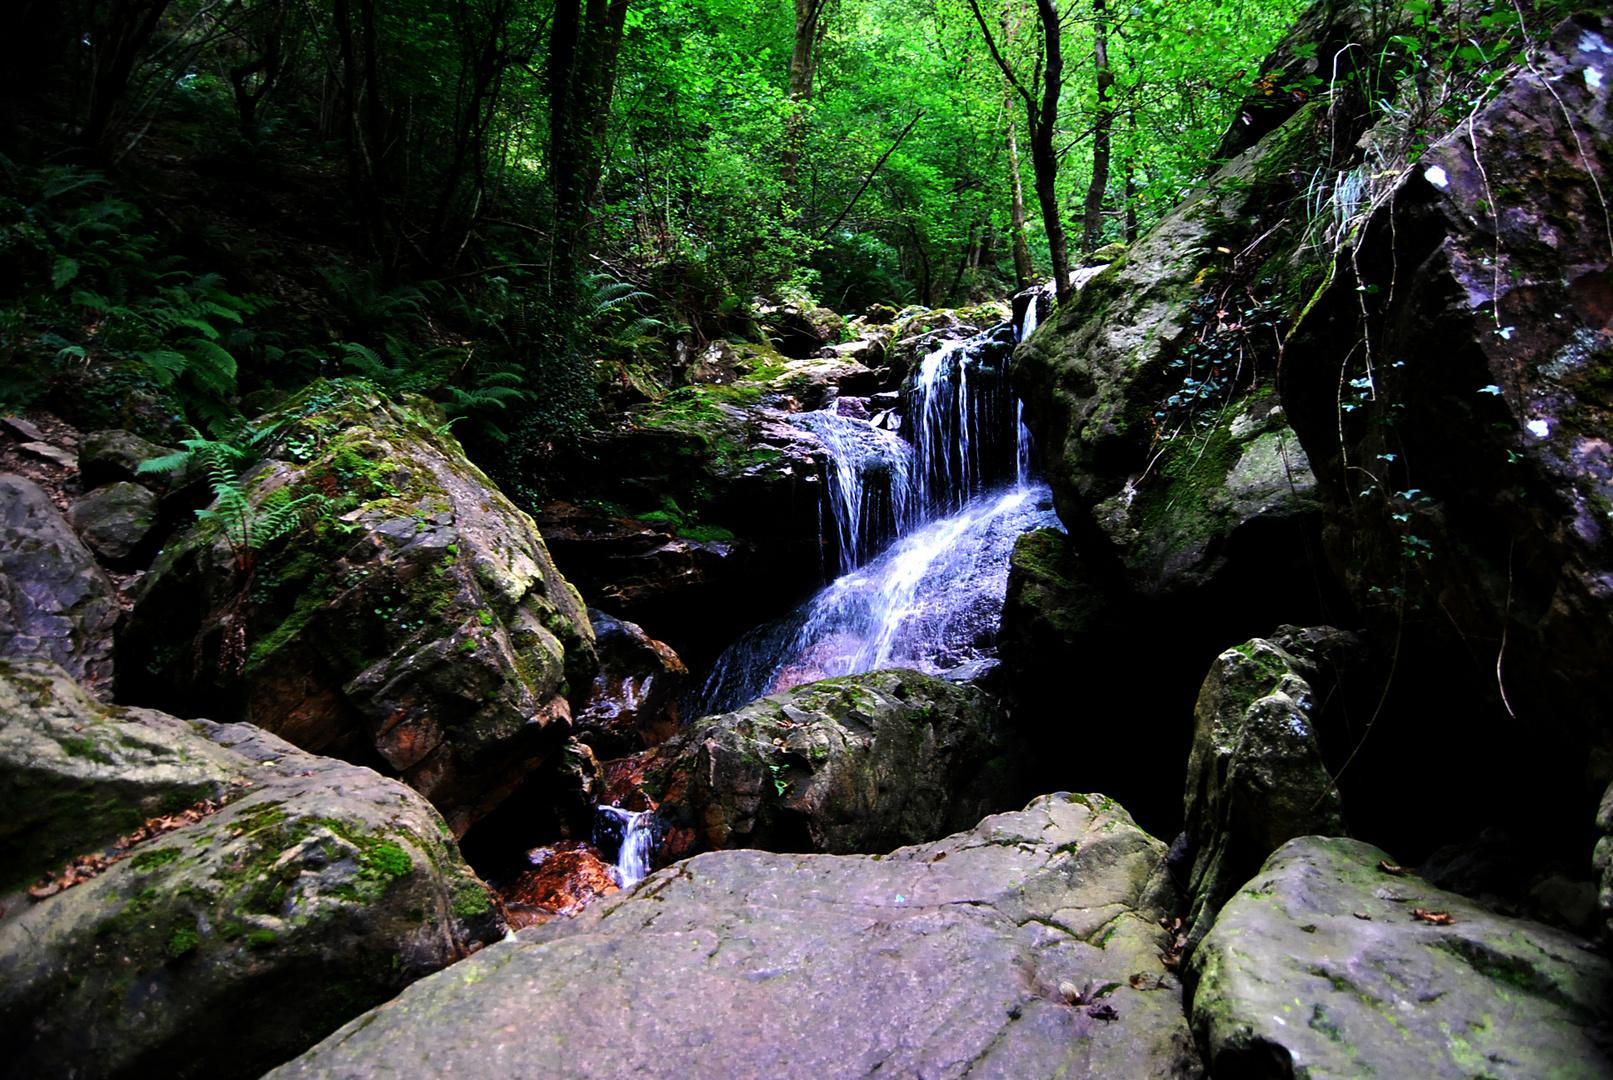 Un rincón del bosque